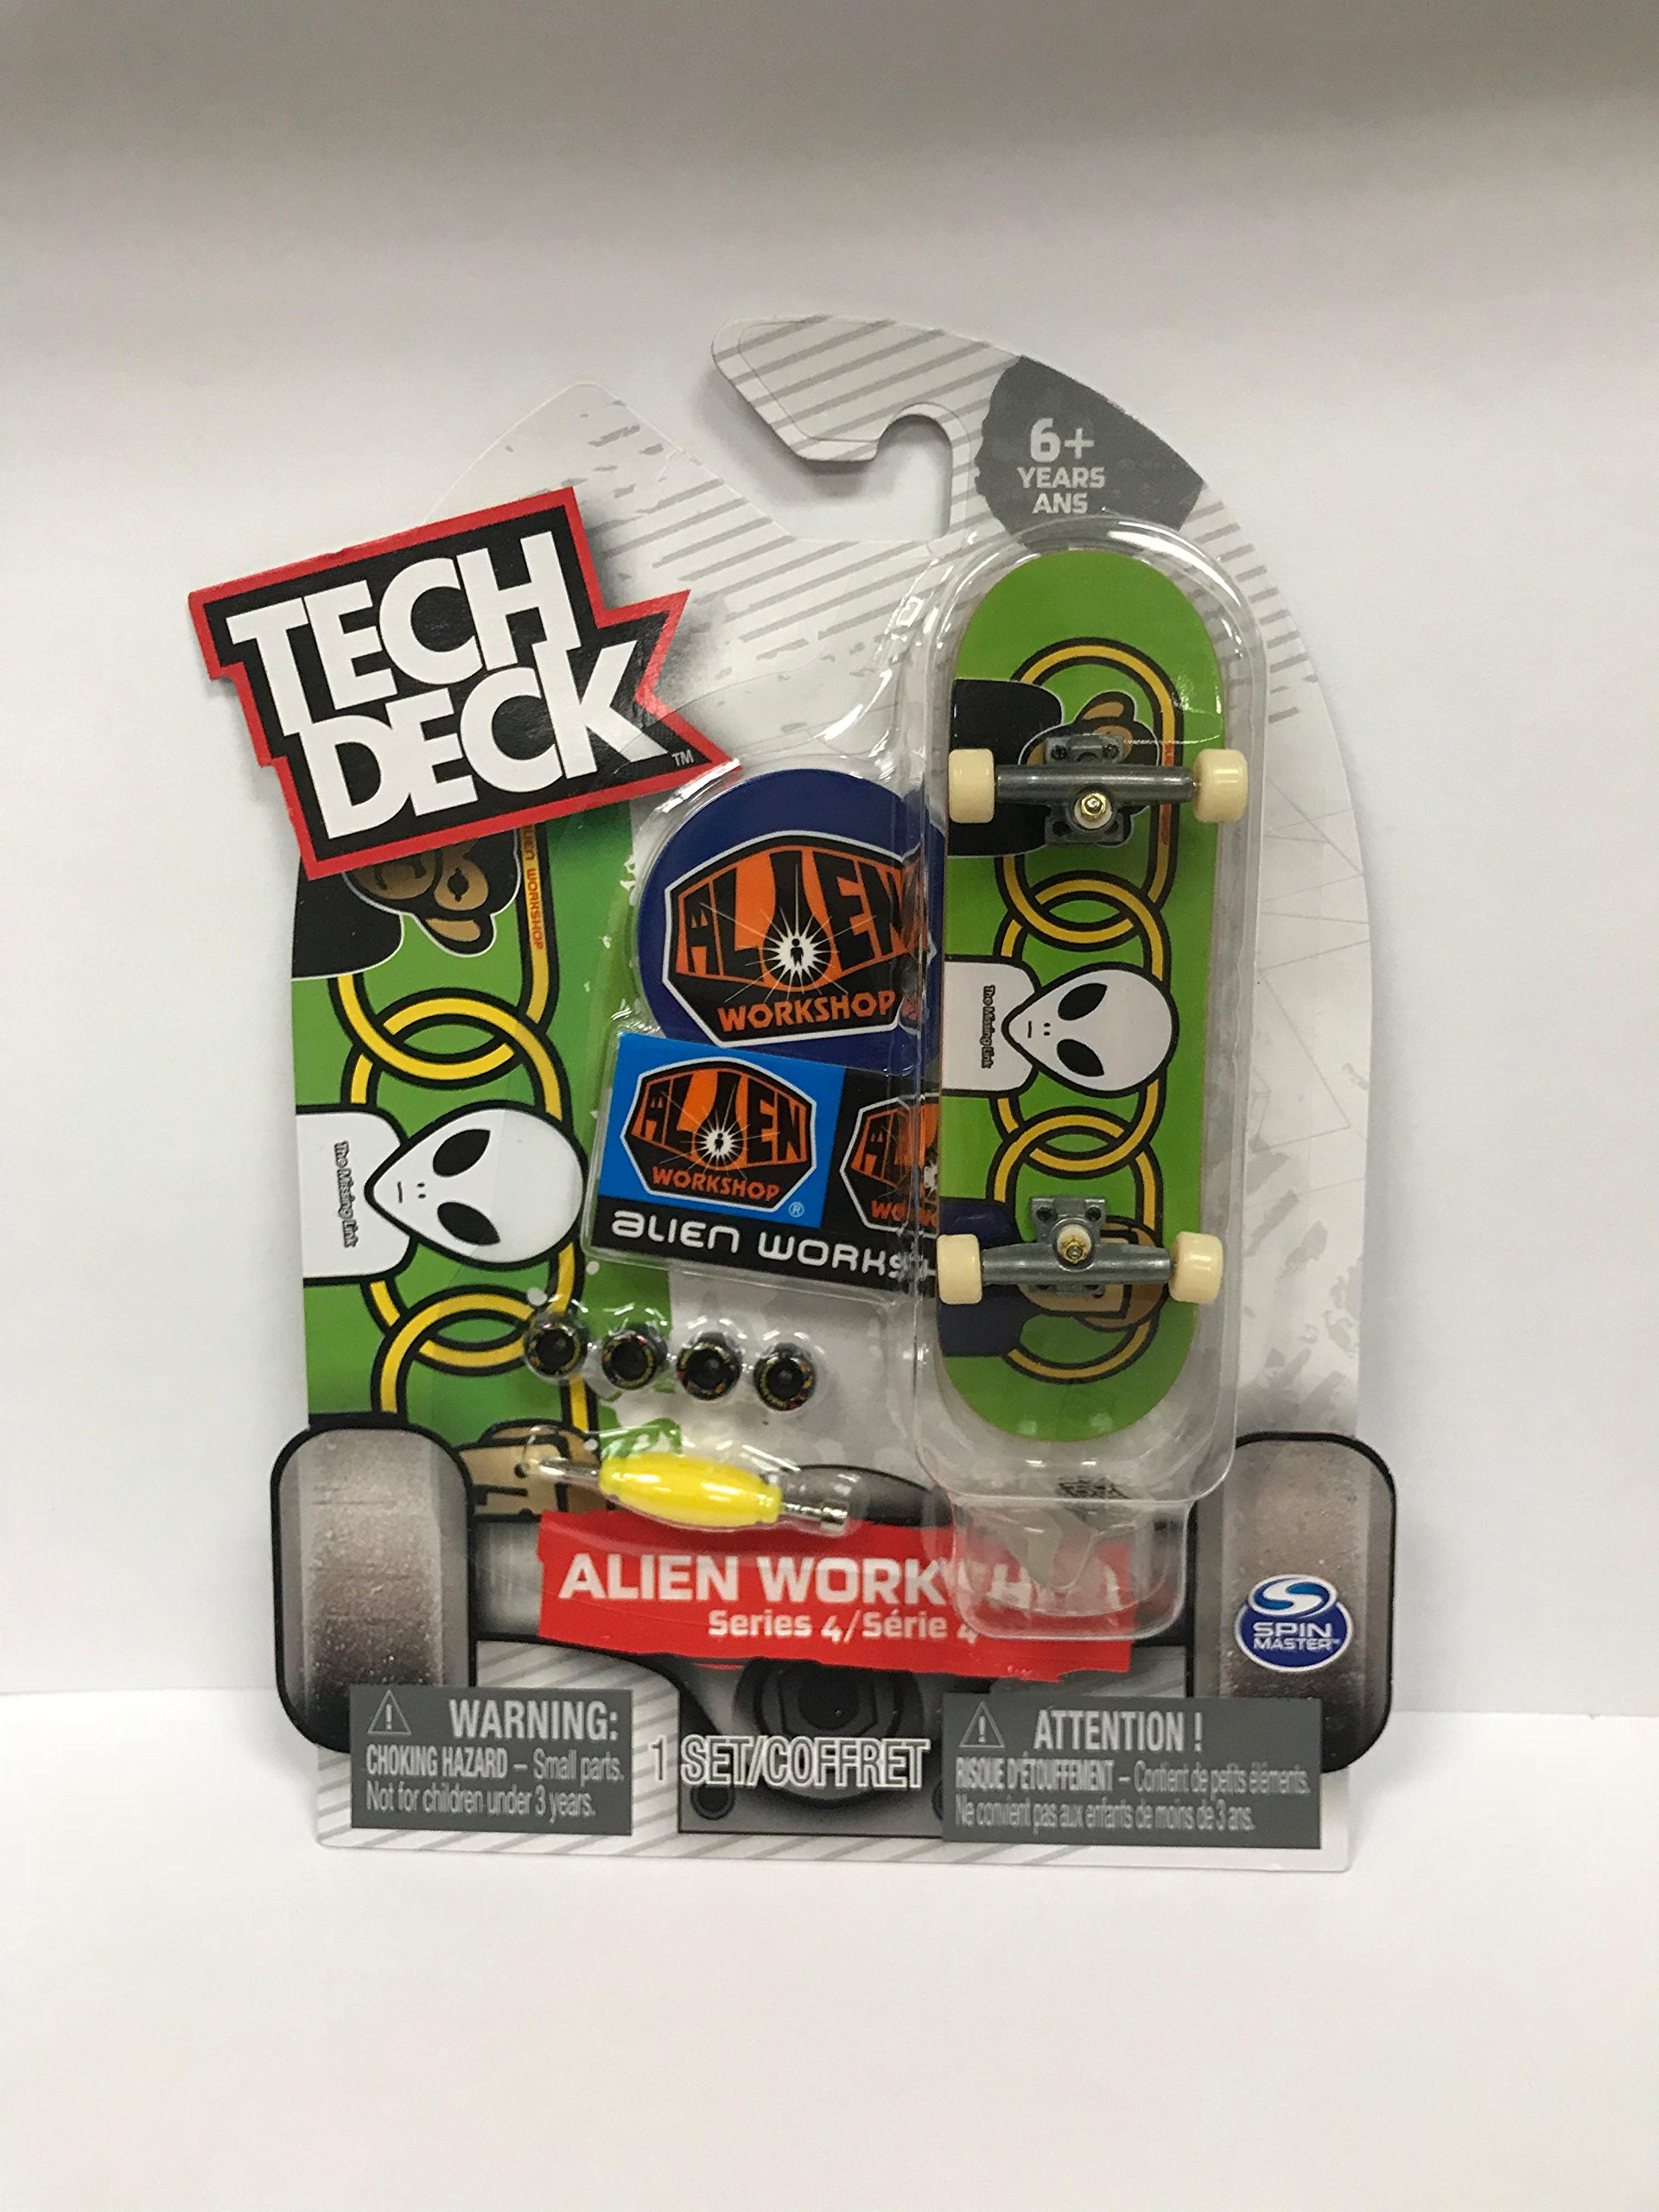 Tech Deck Series 4 Alien Workshop Green Fingerboard Deck